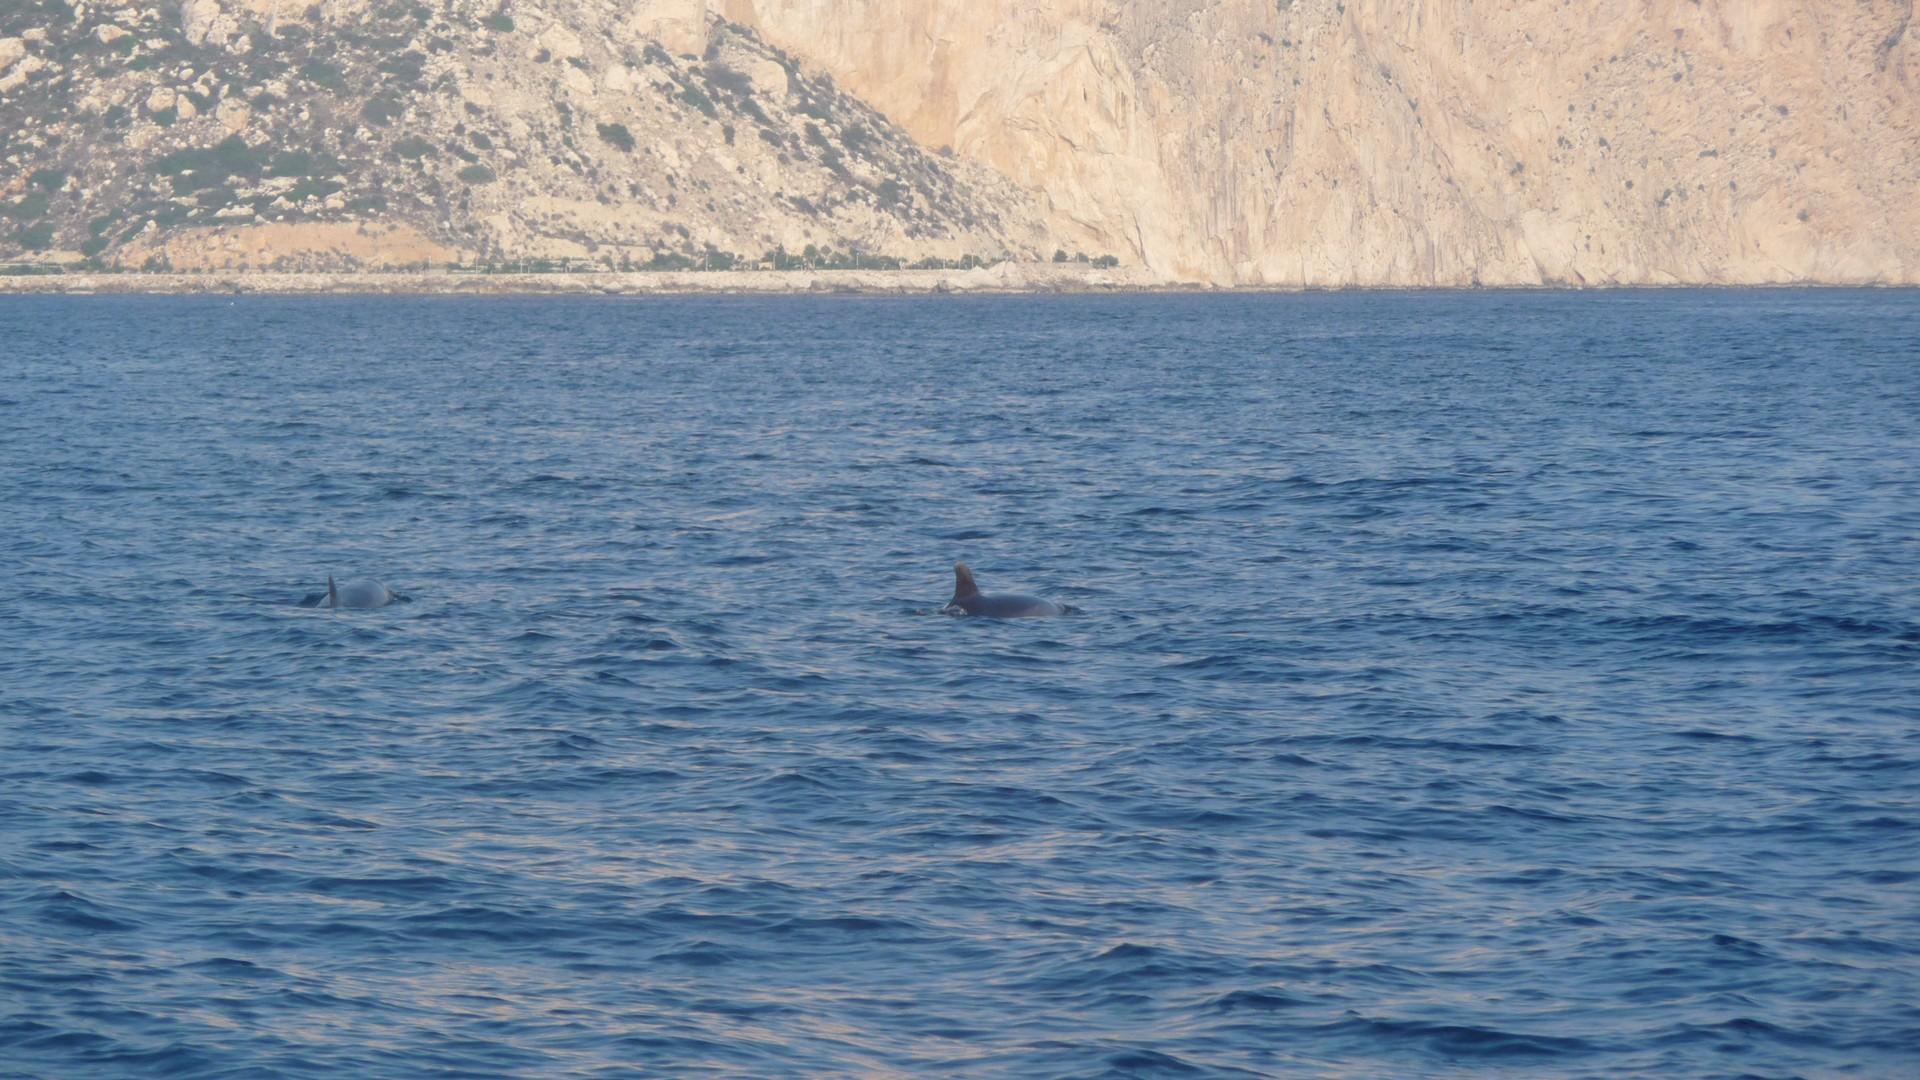 Dolfijnen, Calpe, Costa Blanca, Spanje